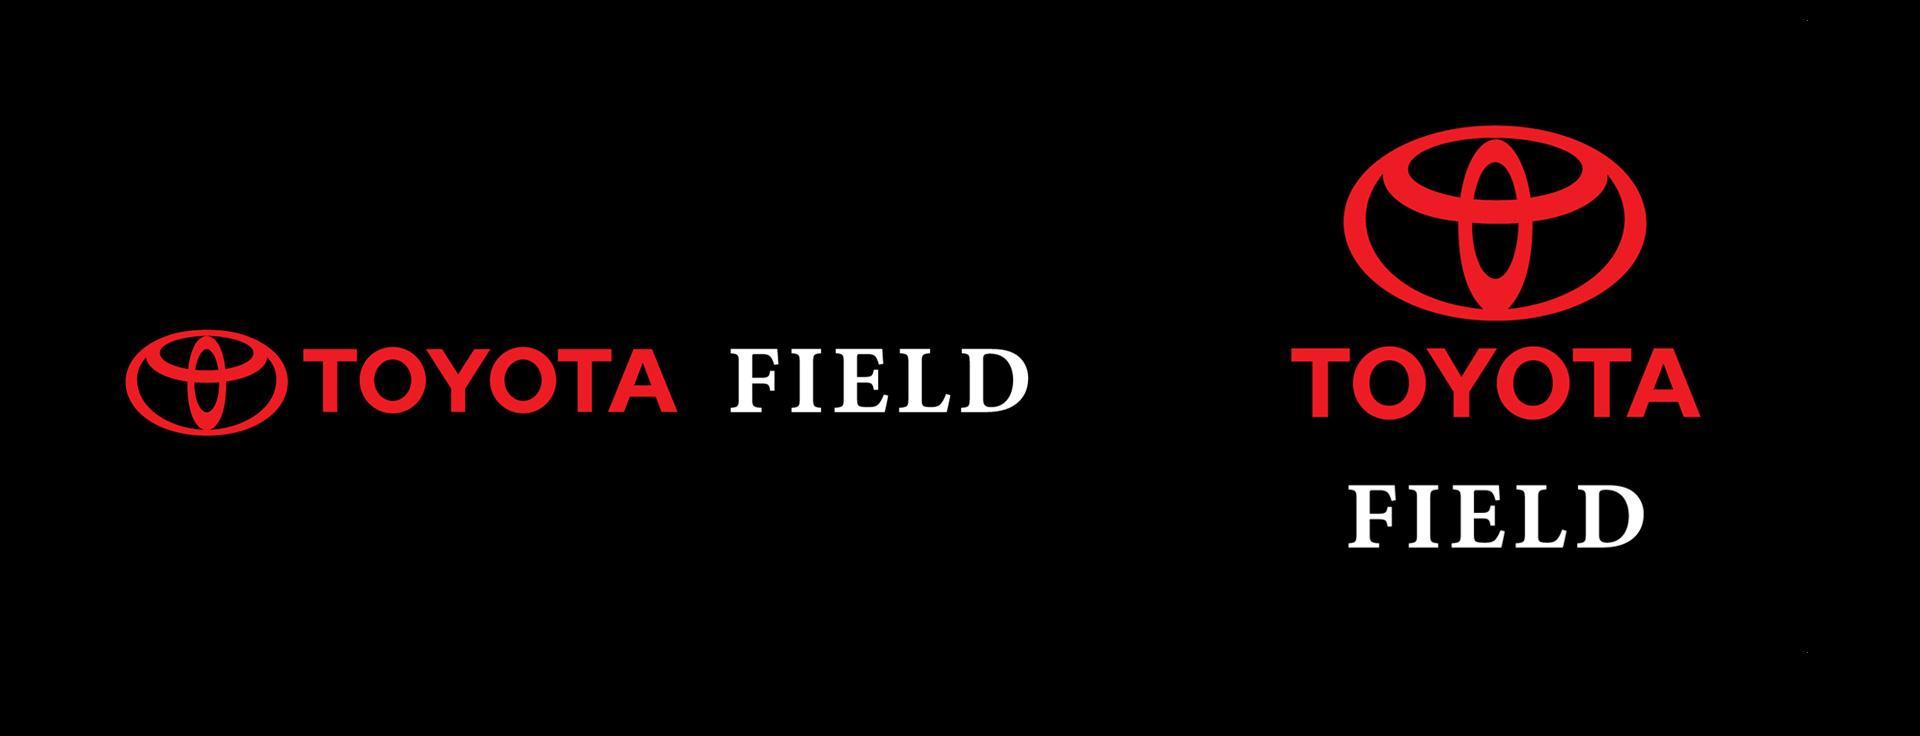 Toyota Field Logo Black